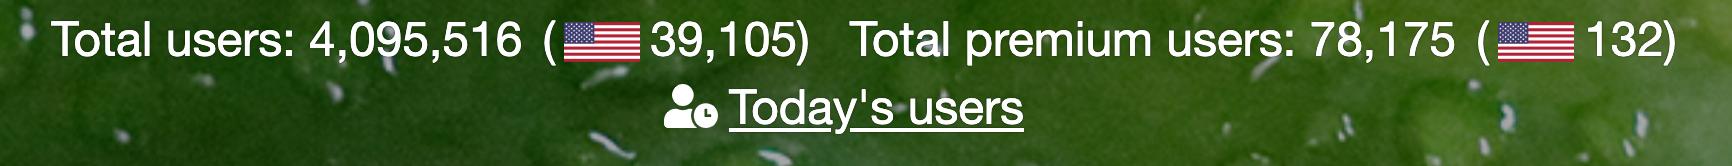 statistics of users